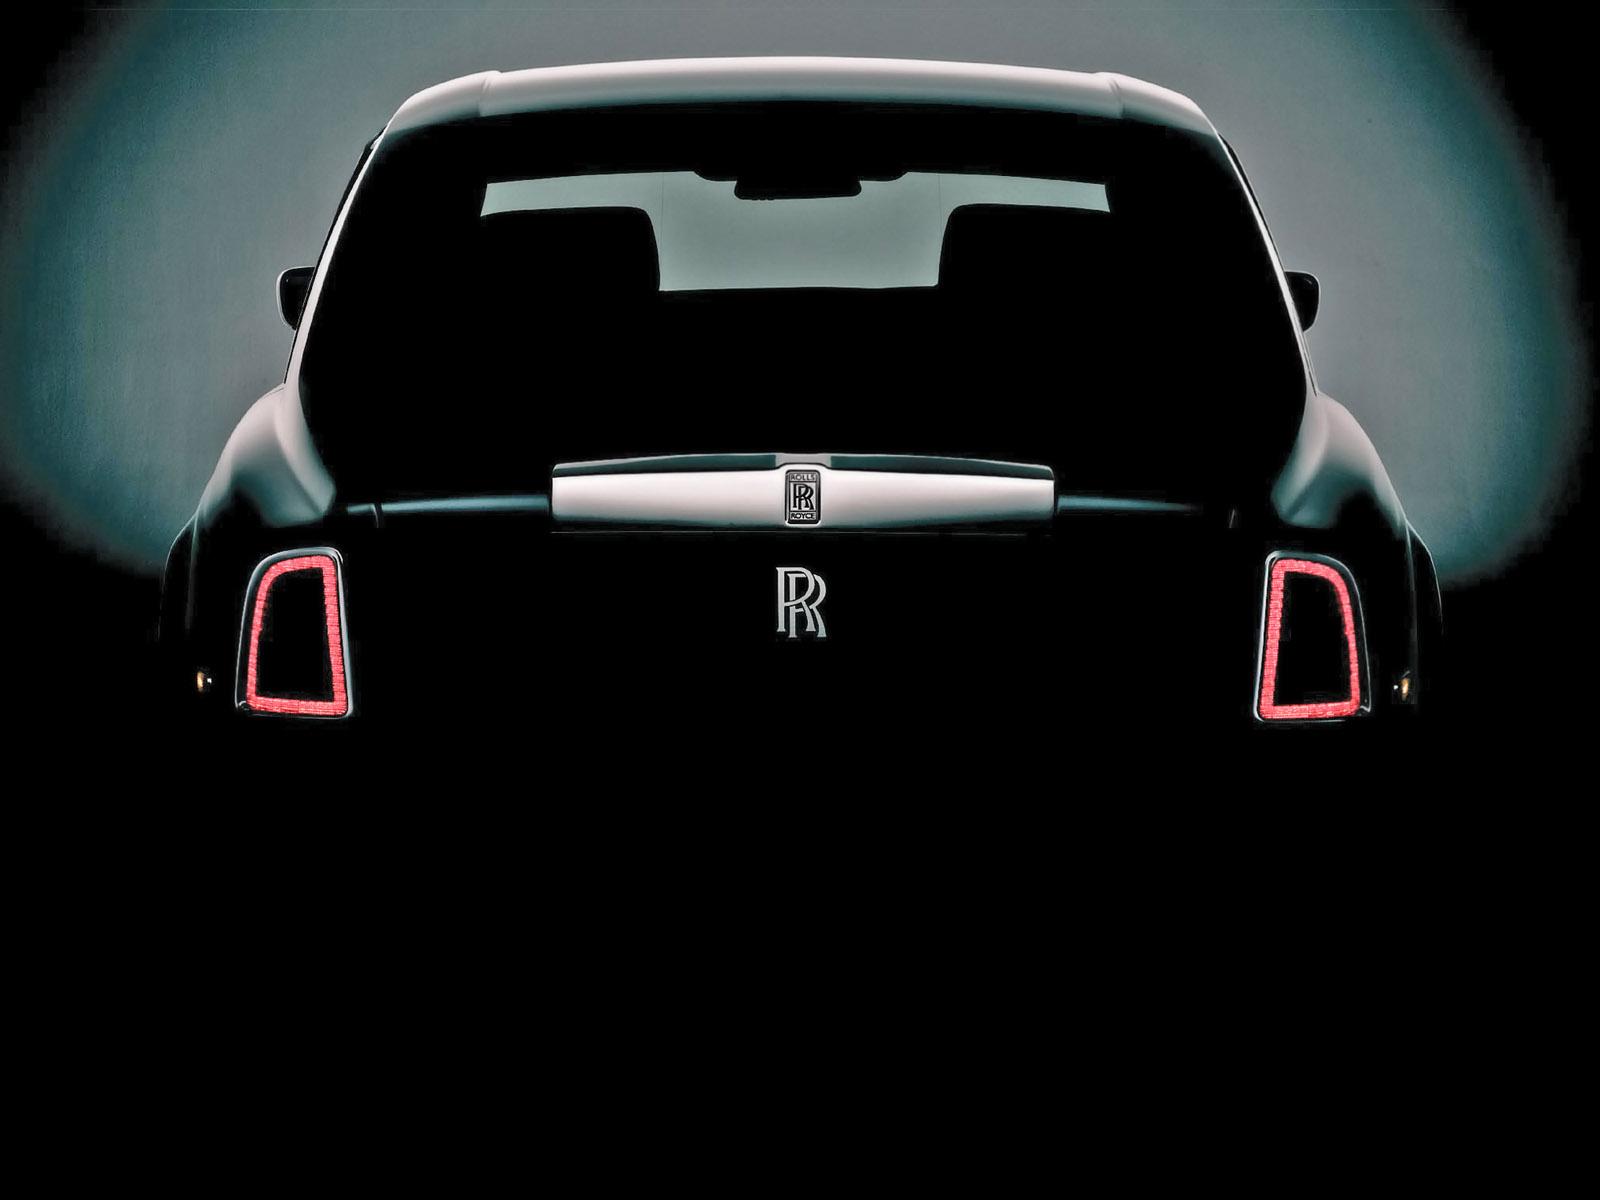 Rolls Royce Logo Phone Wallpaper 4k 1600x1200 Wallpaper Teahub Io